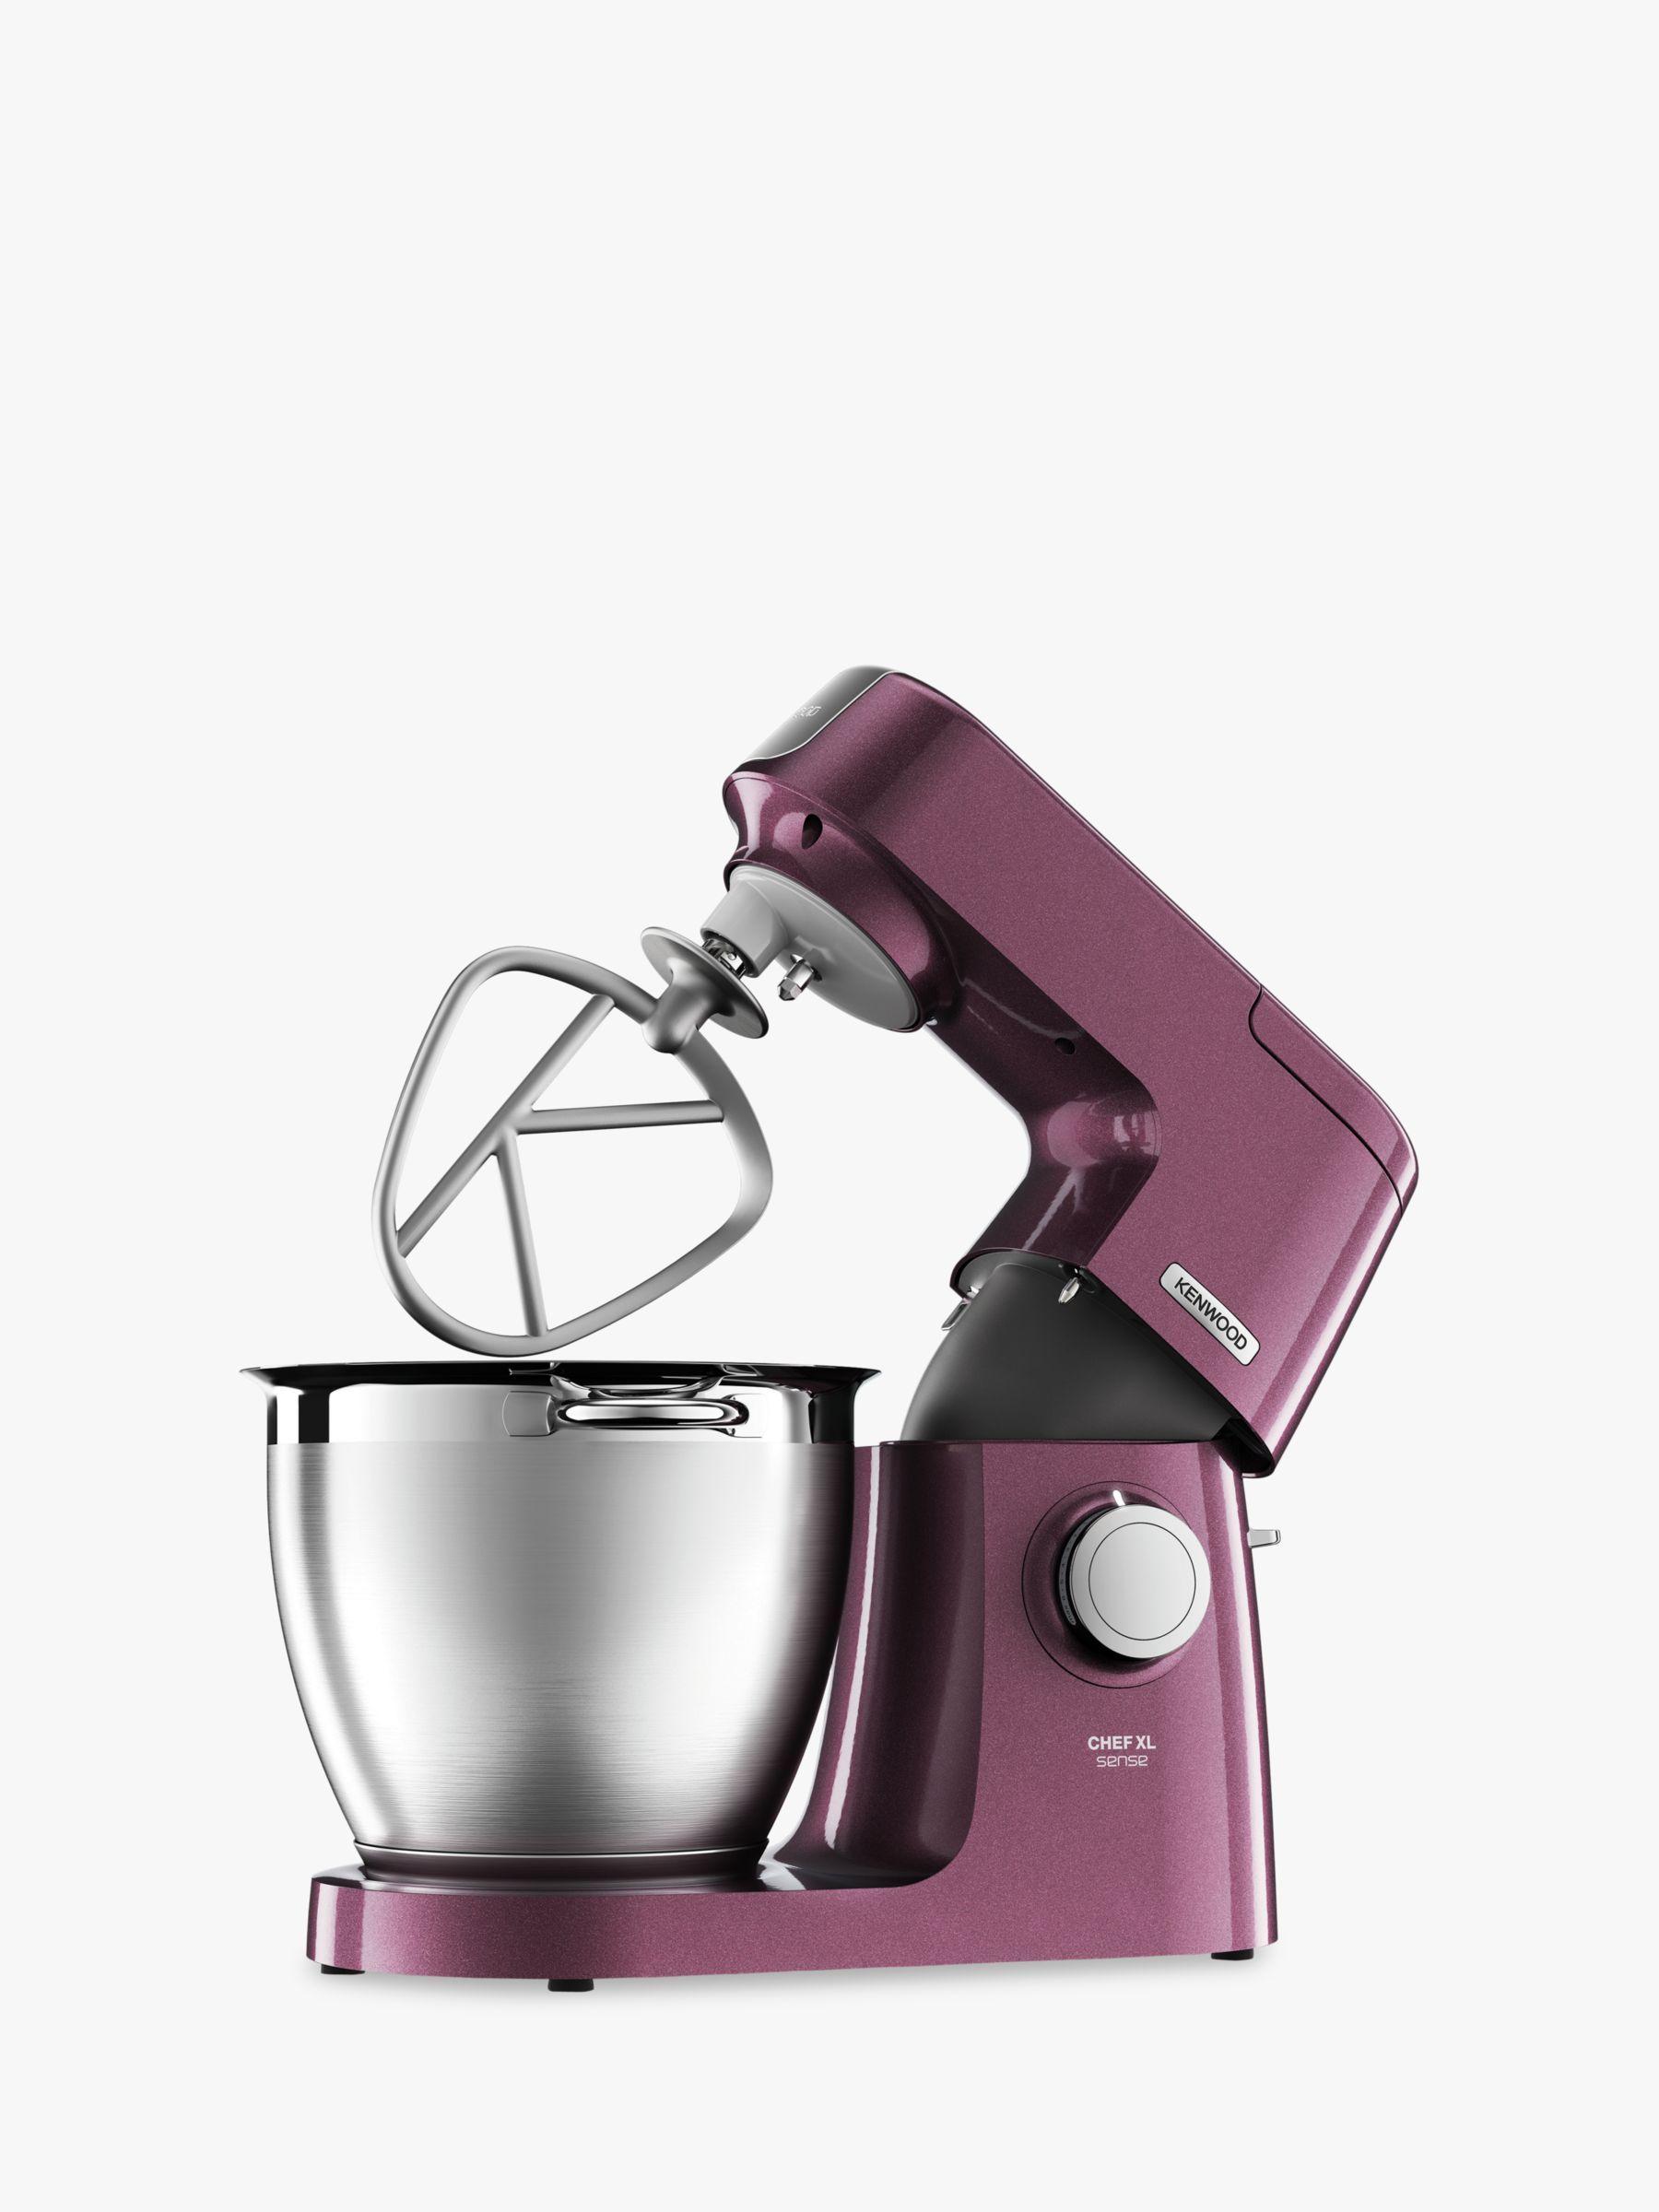 Kenwood chef xl sense special edition food mixer purple